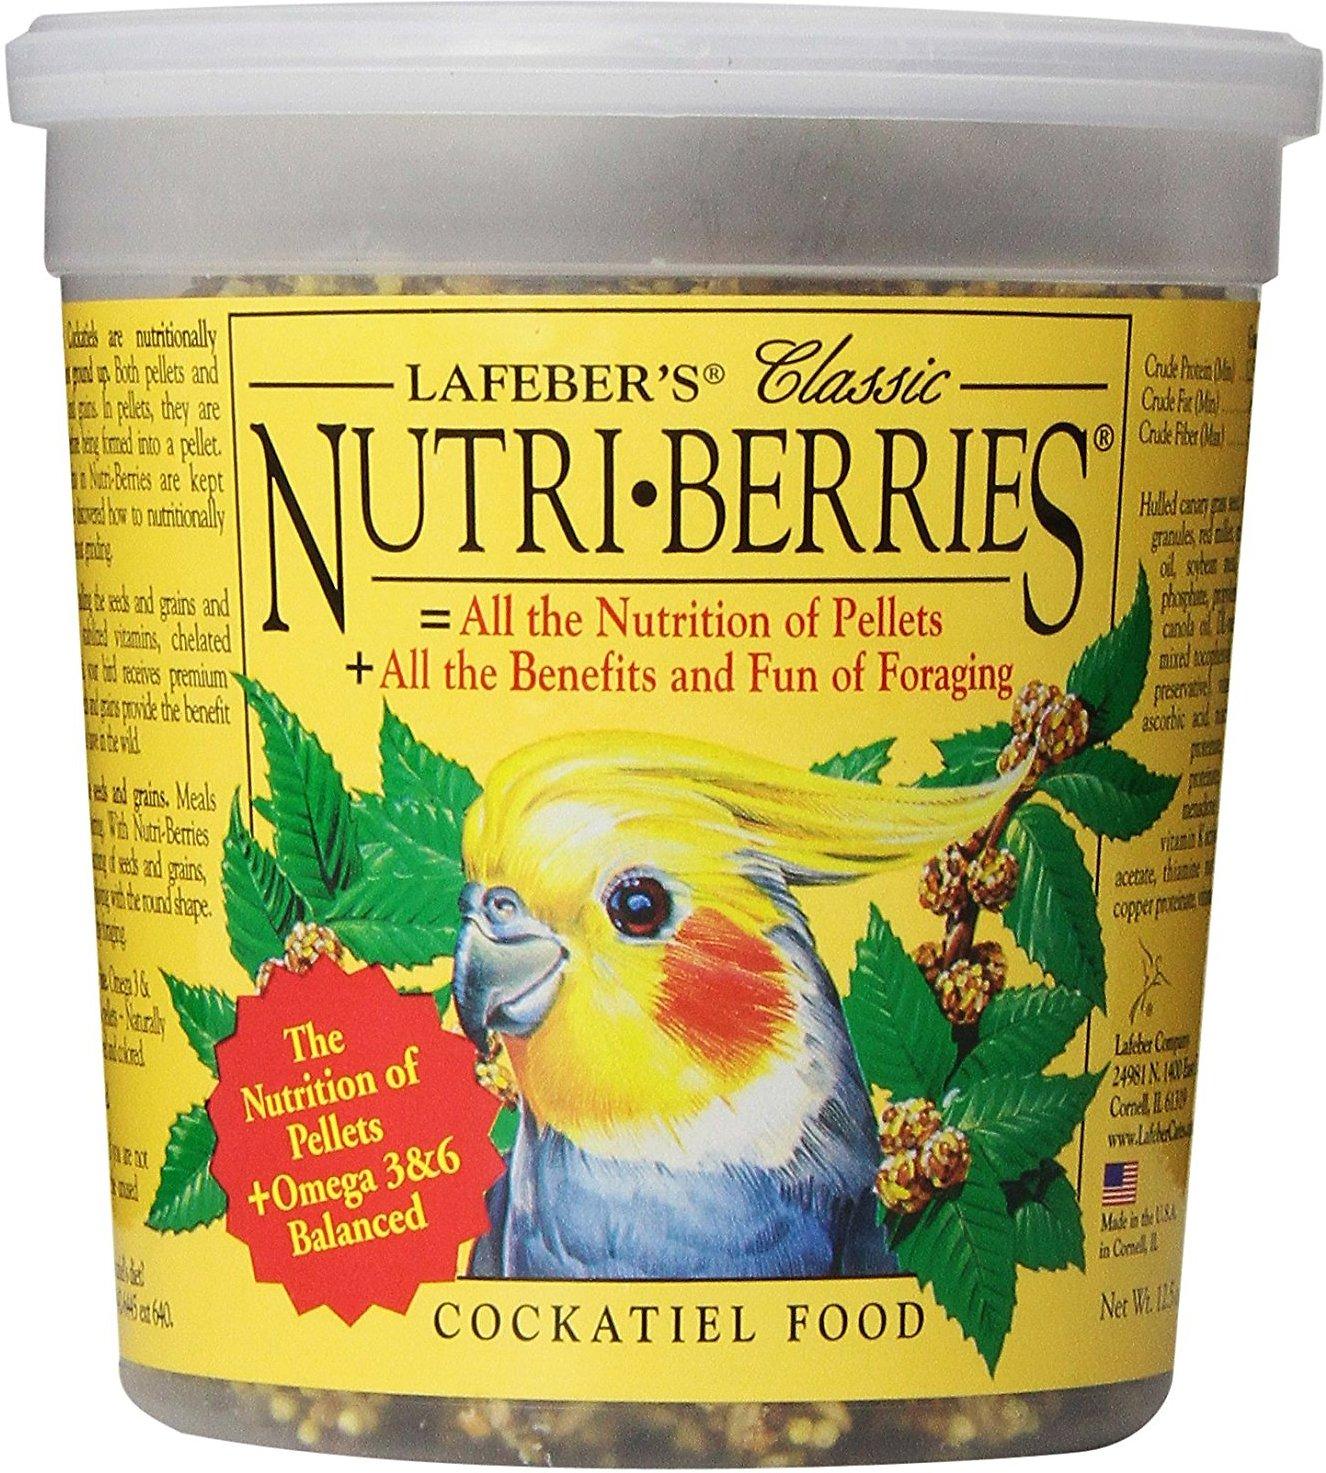 Lafeber Classic Nutri-Berries Cockatiel Bird Food Image